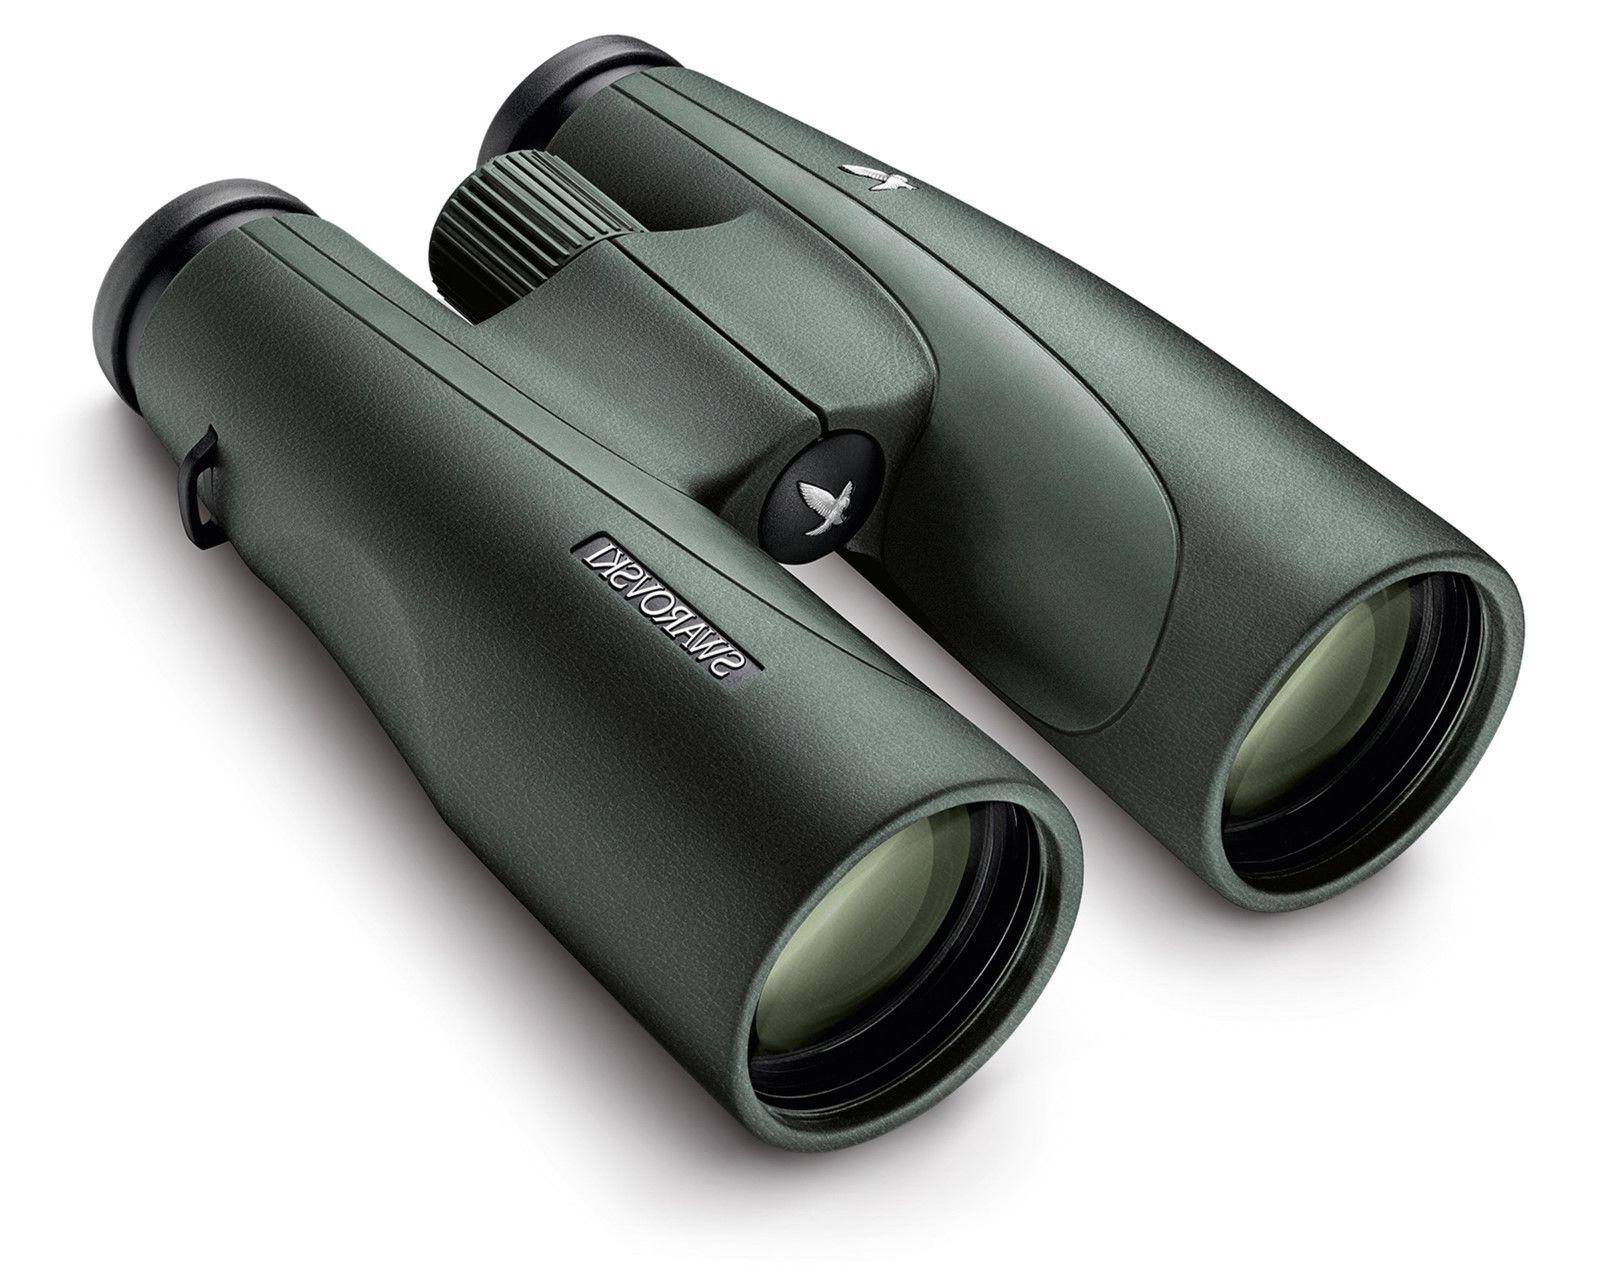 Swarovski 10x56 Binocular SLC HD - Model 58252